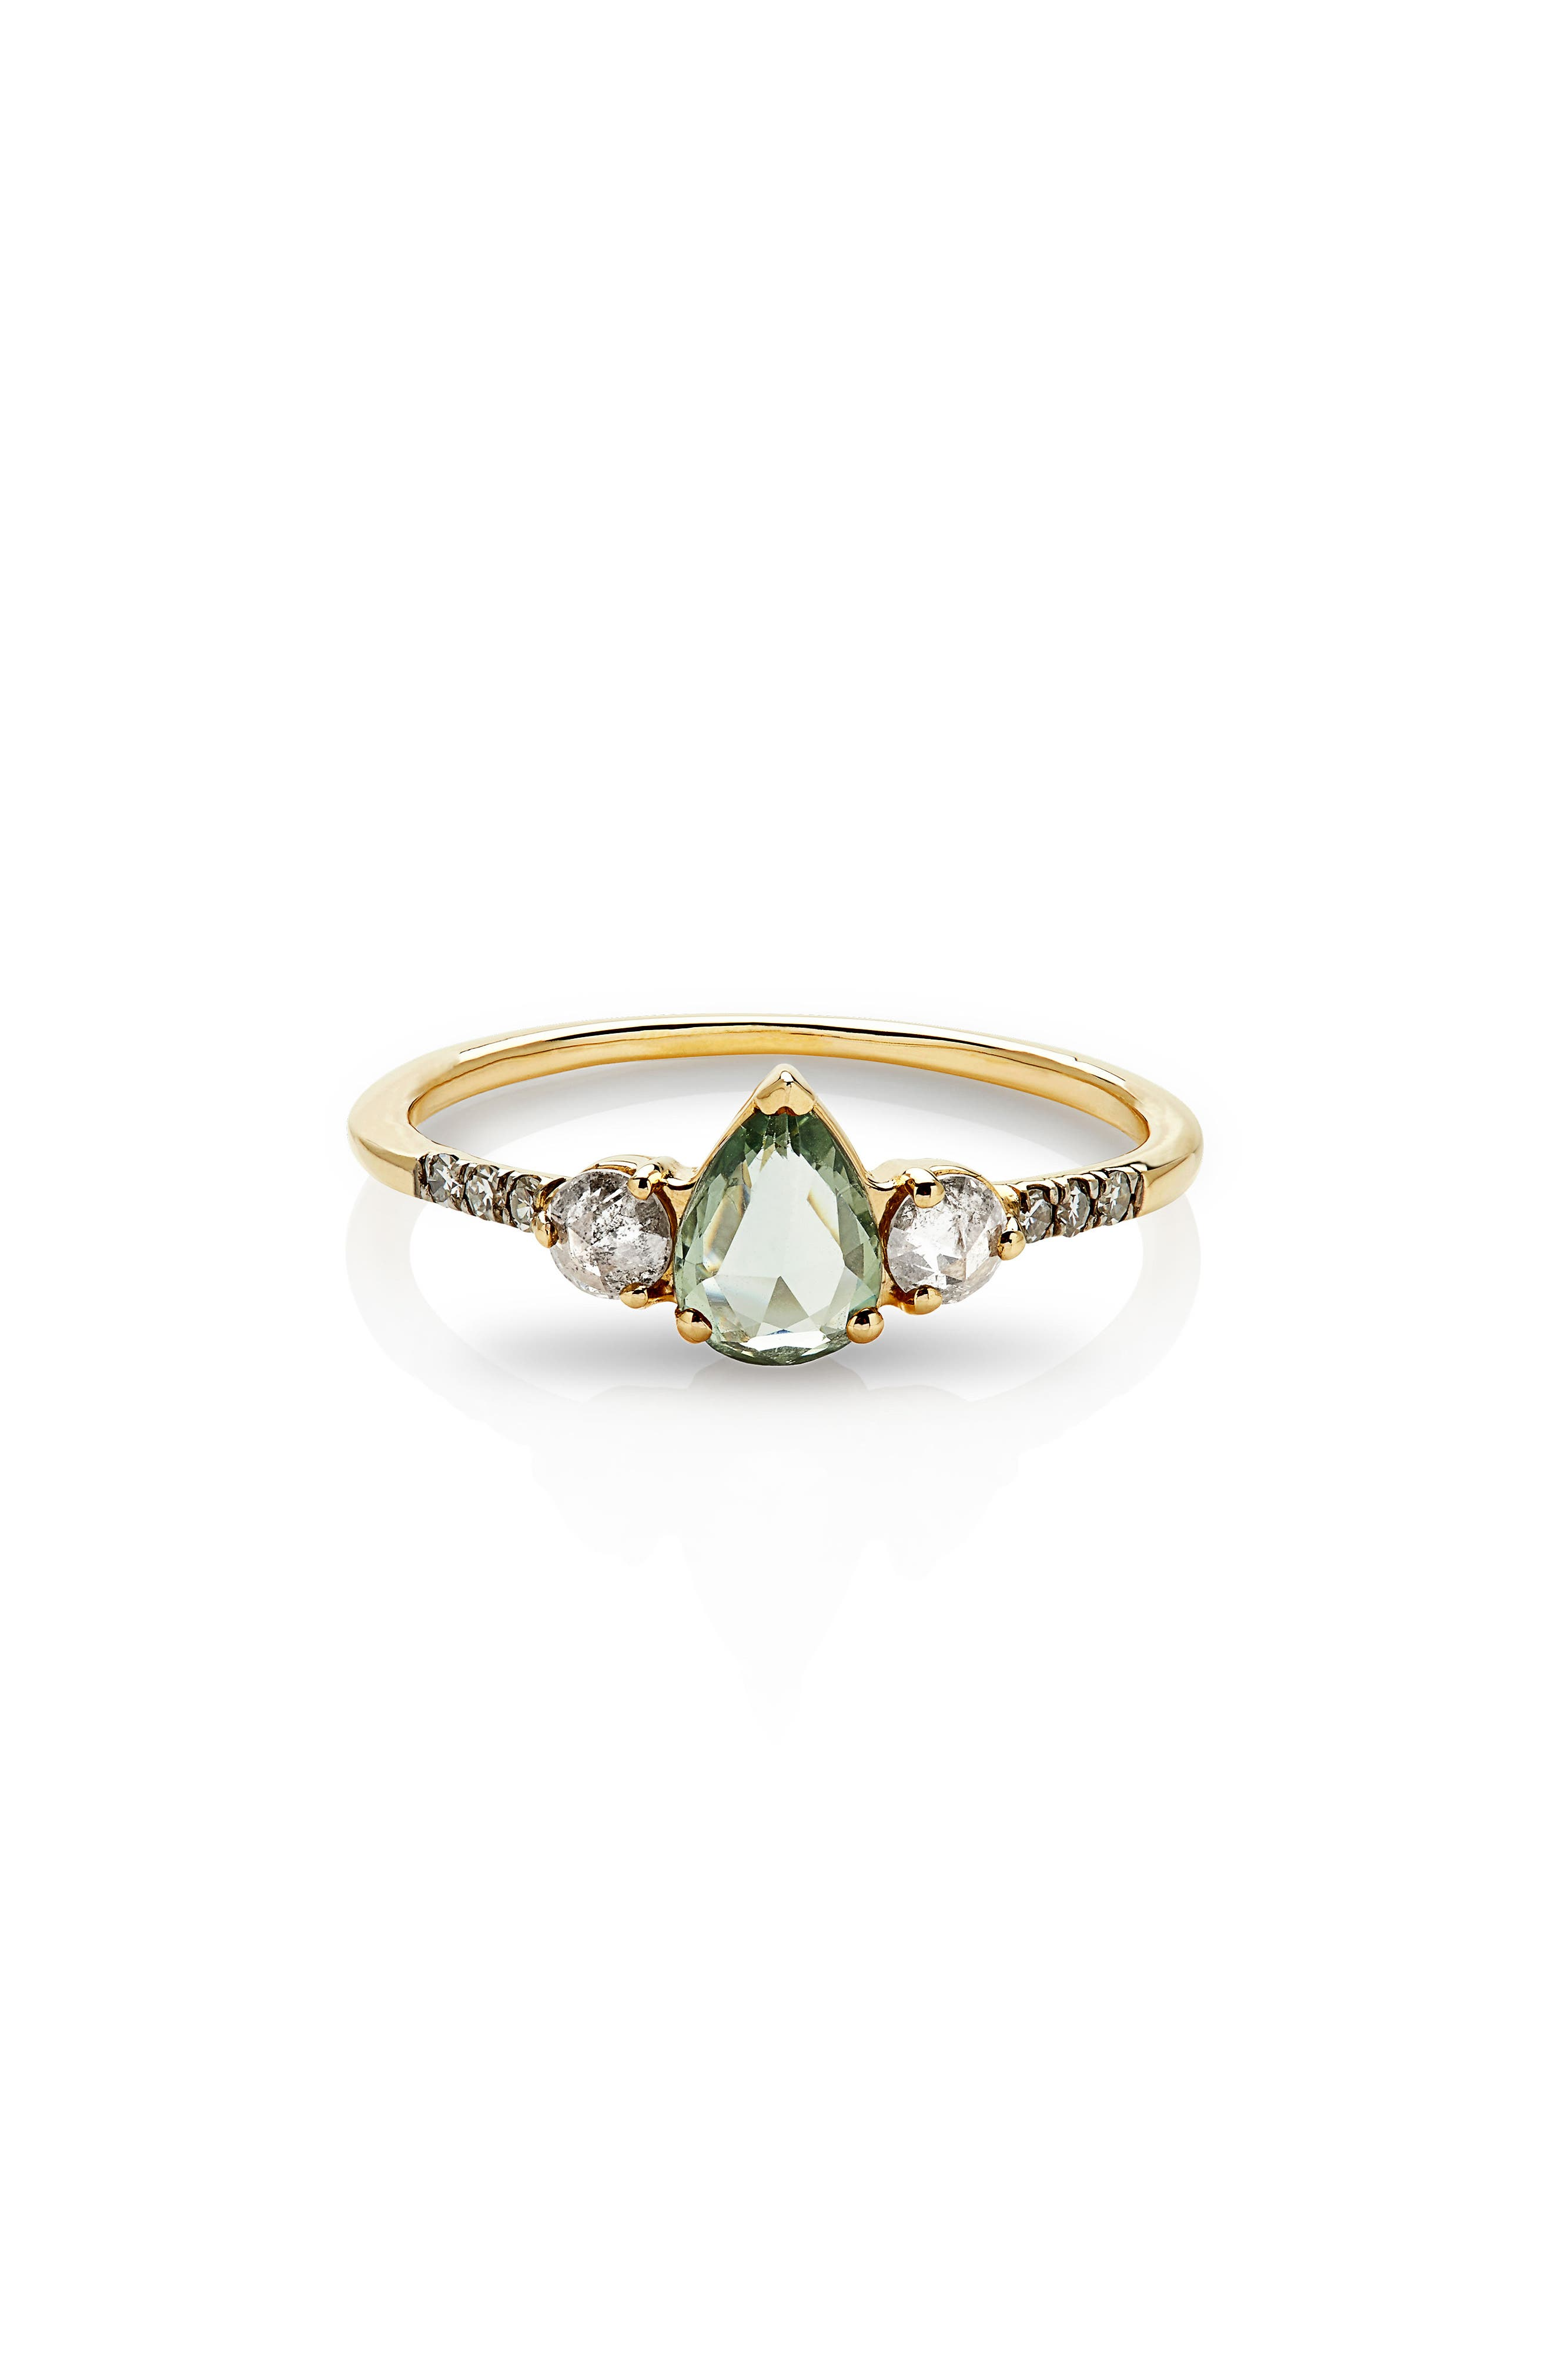 Radiance Sapphire & Diamond Ring,                             Main thumbnail 1, color,                             Yellow Gold/ Green Sapphire